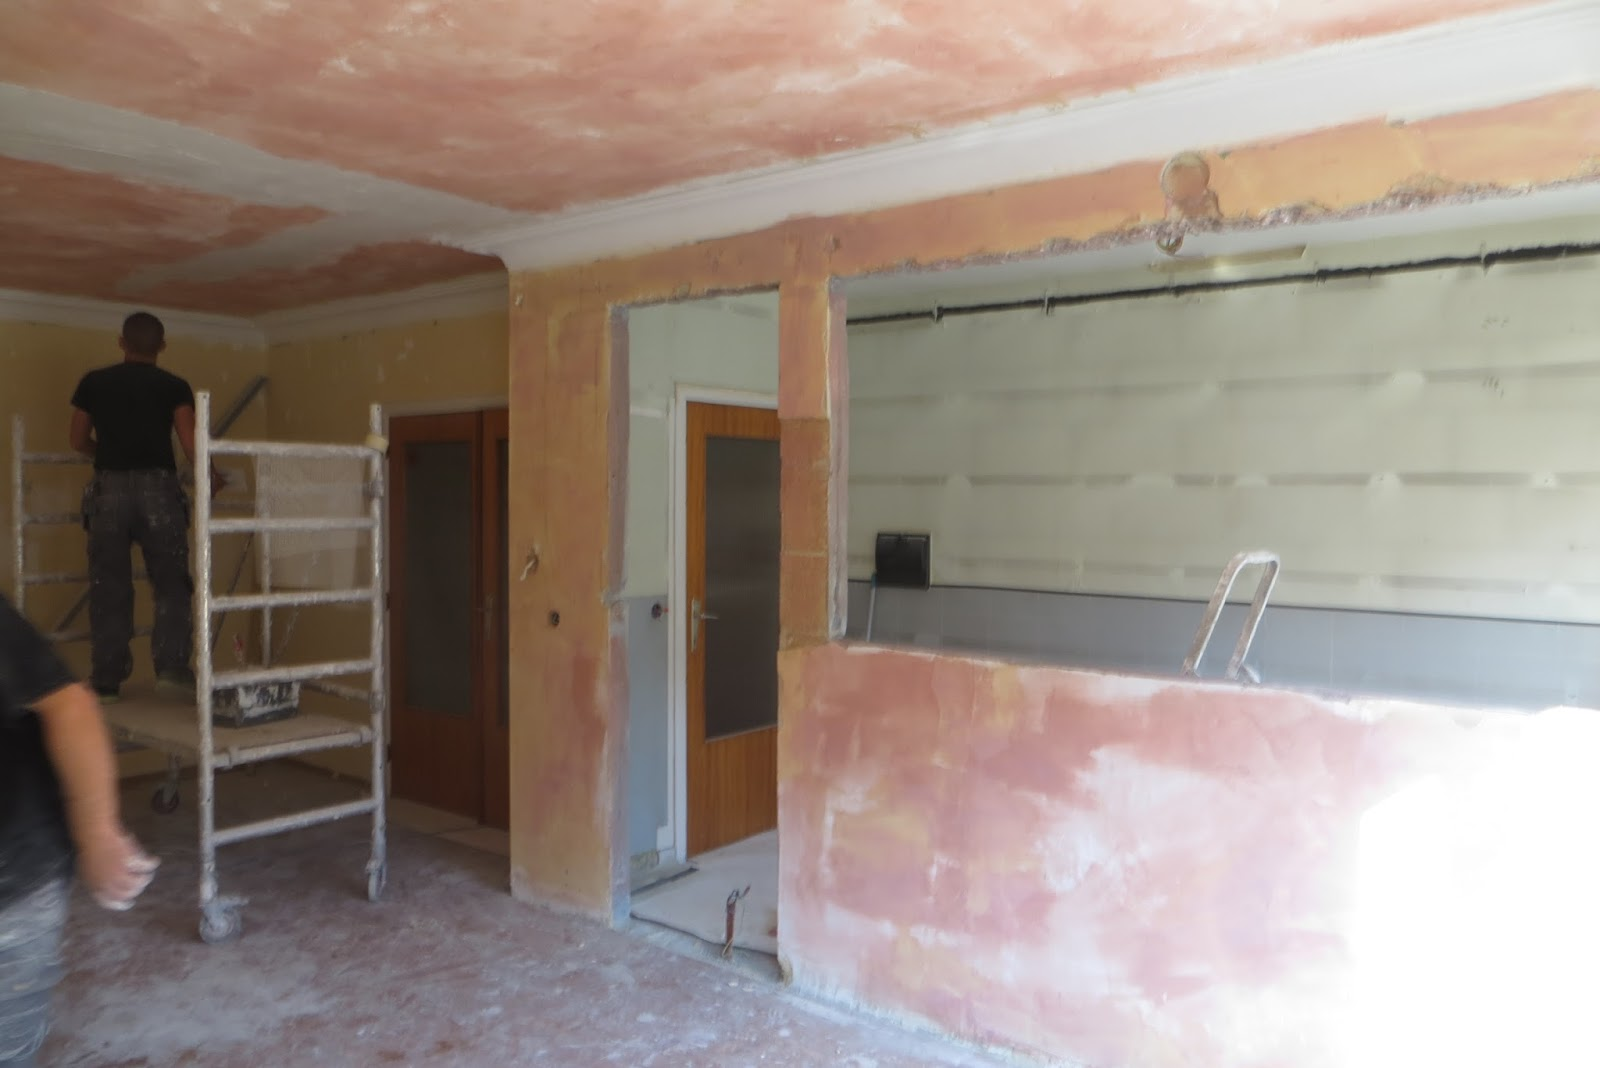 Vernieuwing appartement zellik muur afbreken plafond herstellen - Appartement muur ...